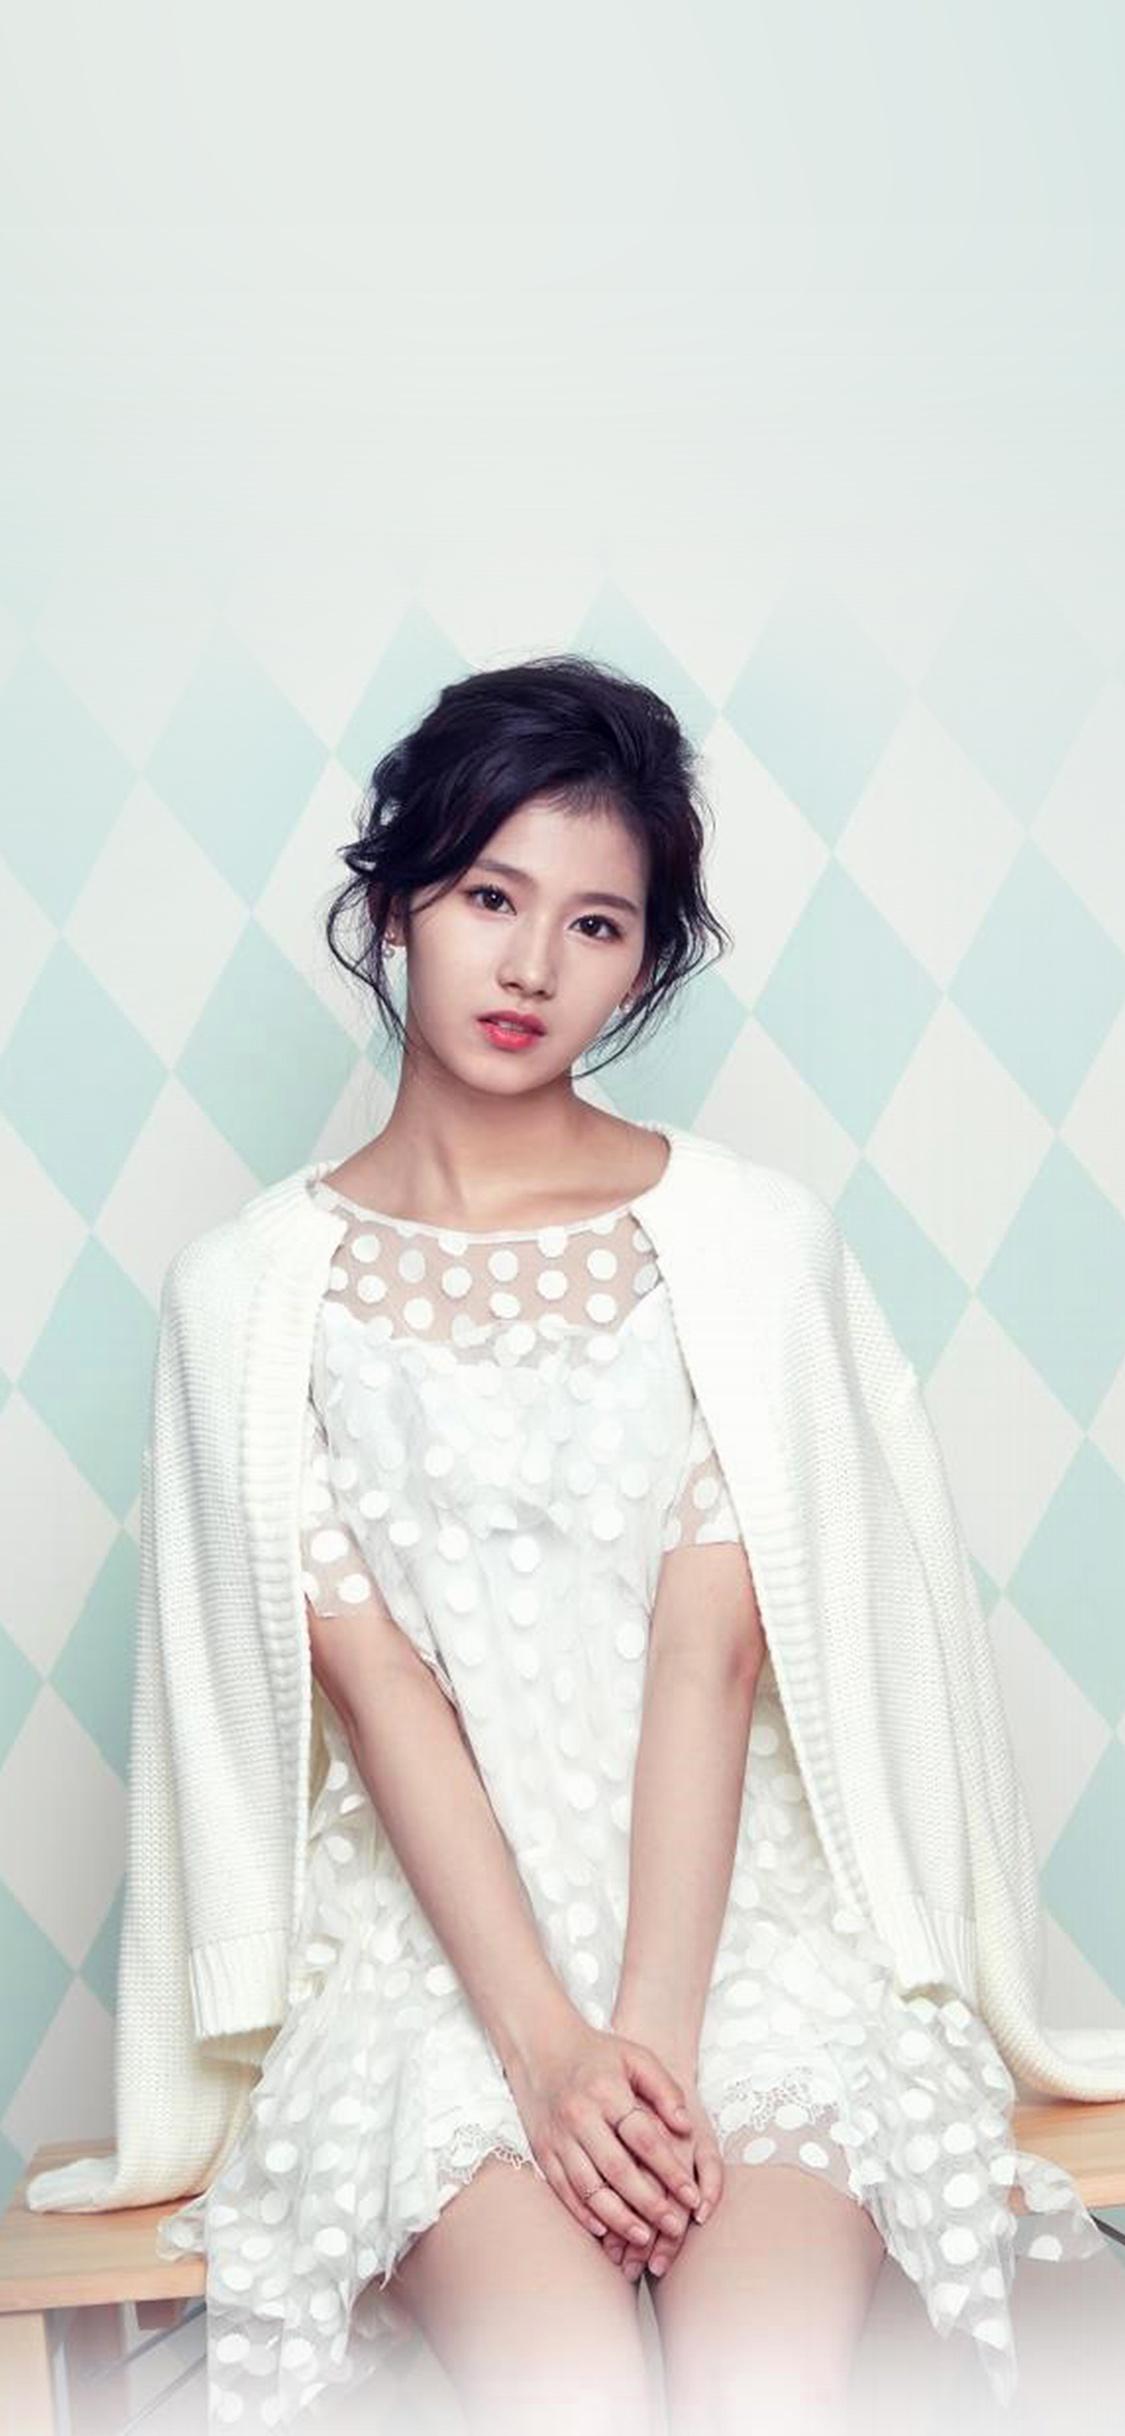 Droid X Girl Wallpaper Hn62 Sana Girl Kpop Twice Wallpaper